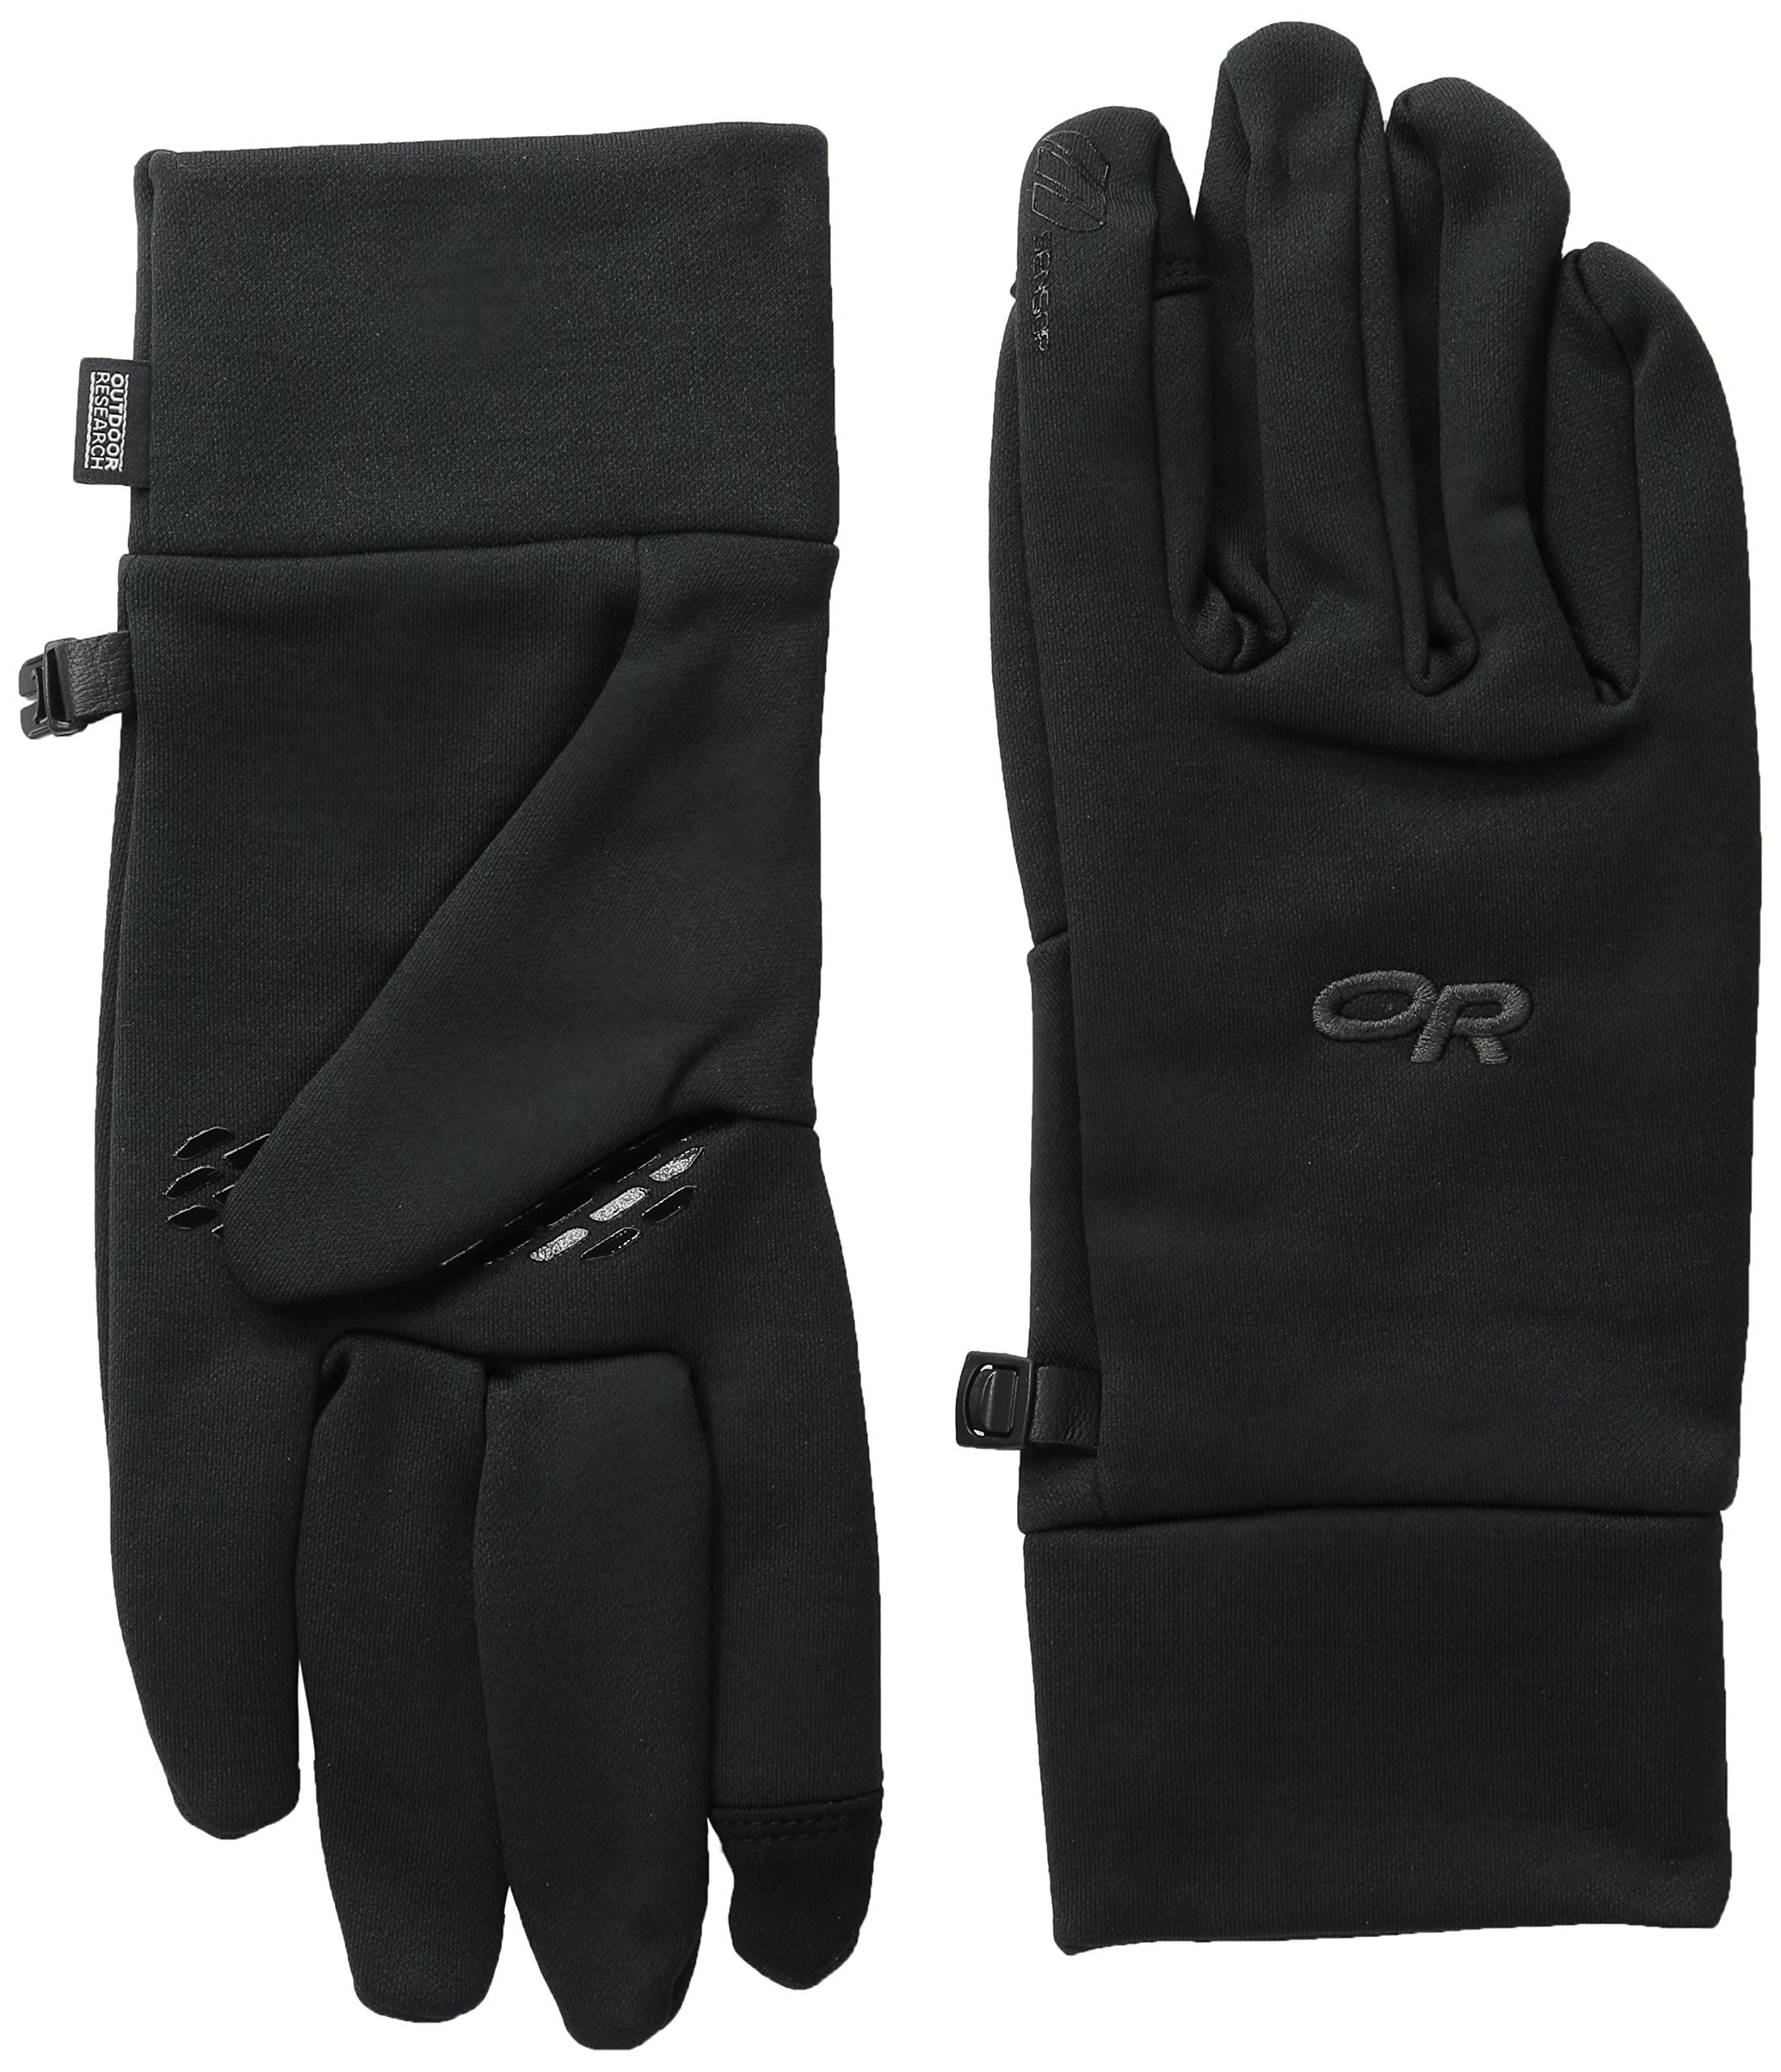 Outdoor Research Men's PL100 Sensor Gloves, Black, X-Large